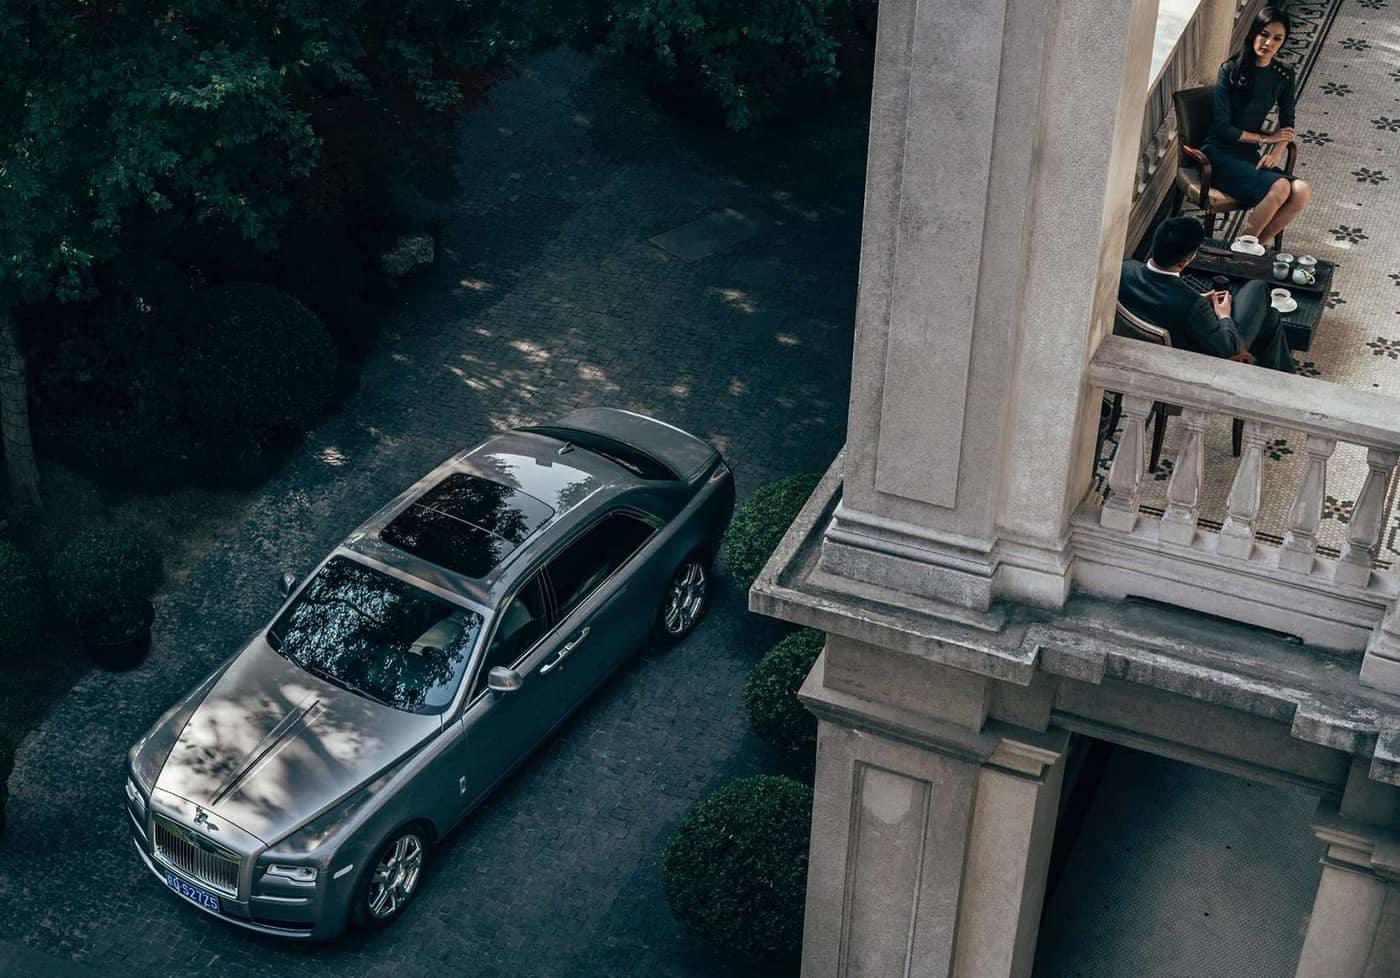 2020 Rolls Royce Ghost Elegance